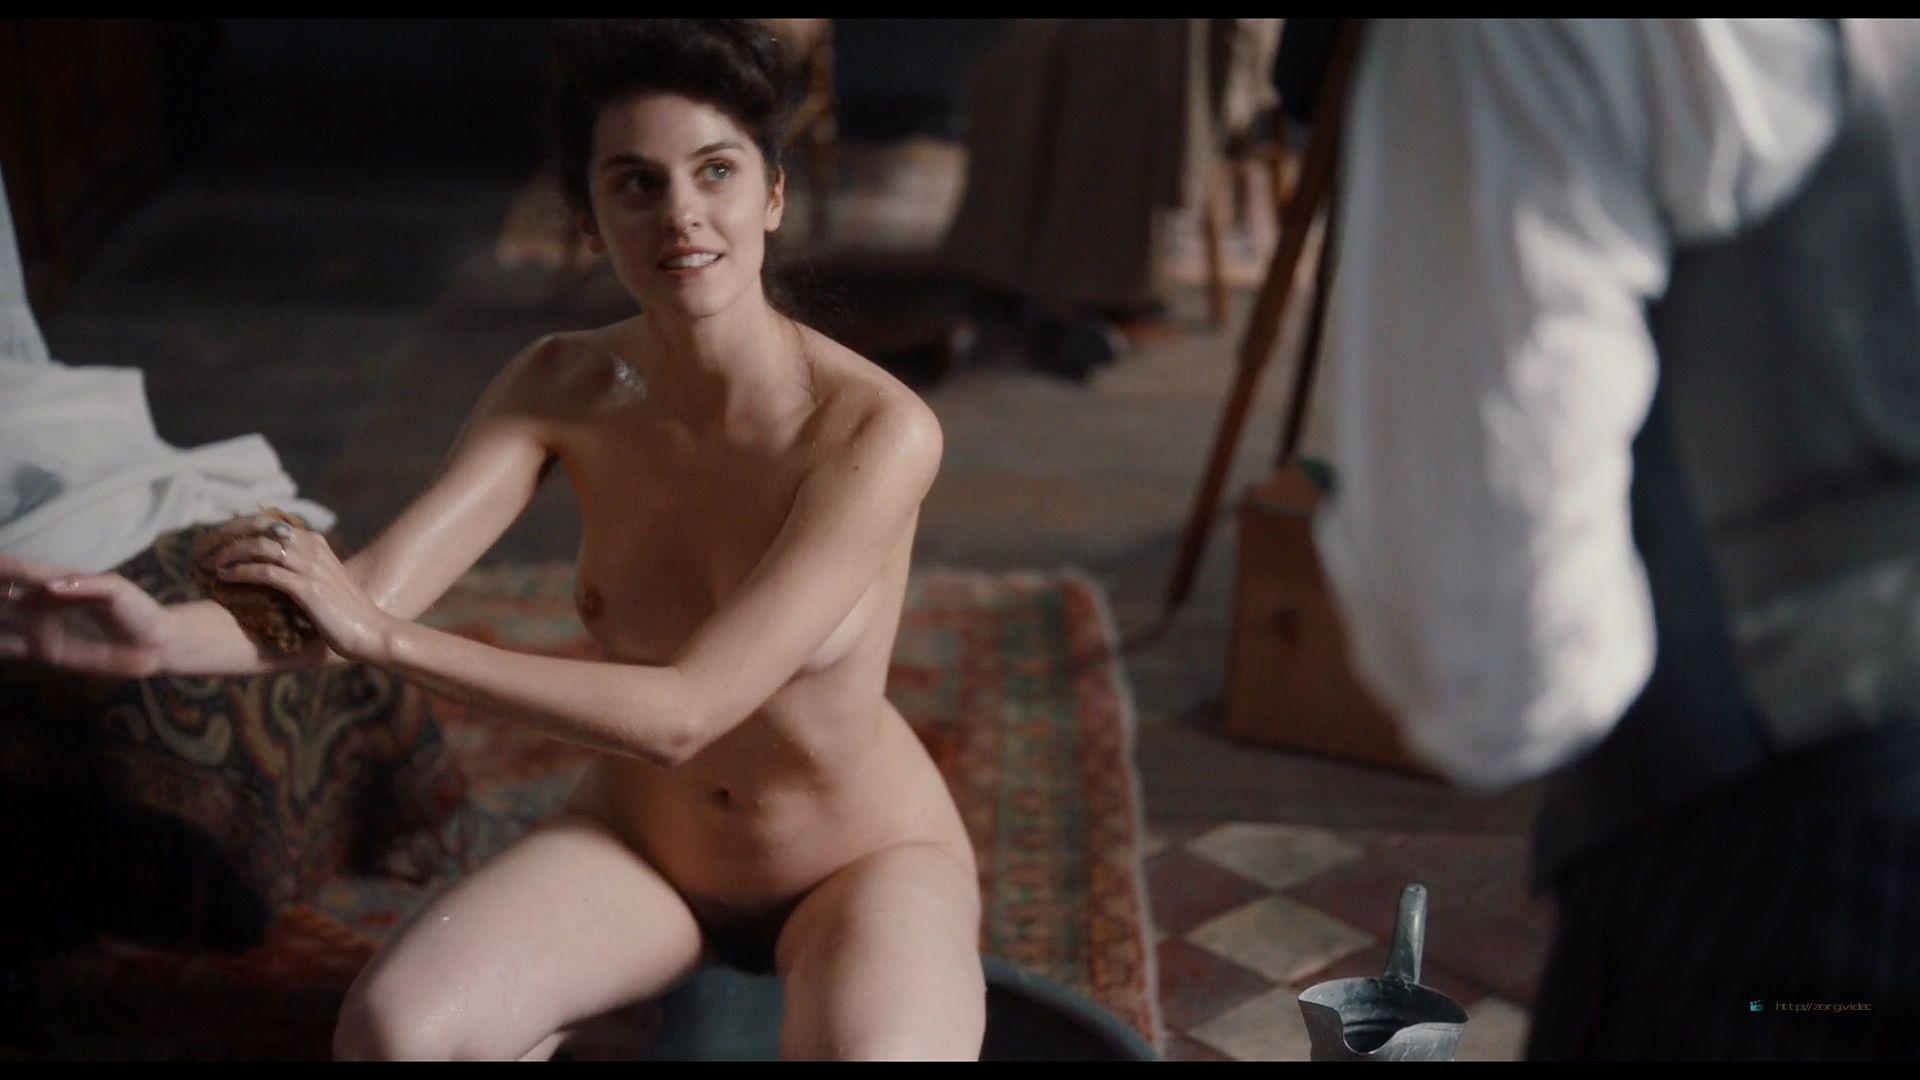 0608000137710_11_Noemie-Merlant-nude-full-frontal-Camelia-Jordana-Amira-Casar-and-others-nude-Curiosa-2019-HD-1080p-Web-.jpg